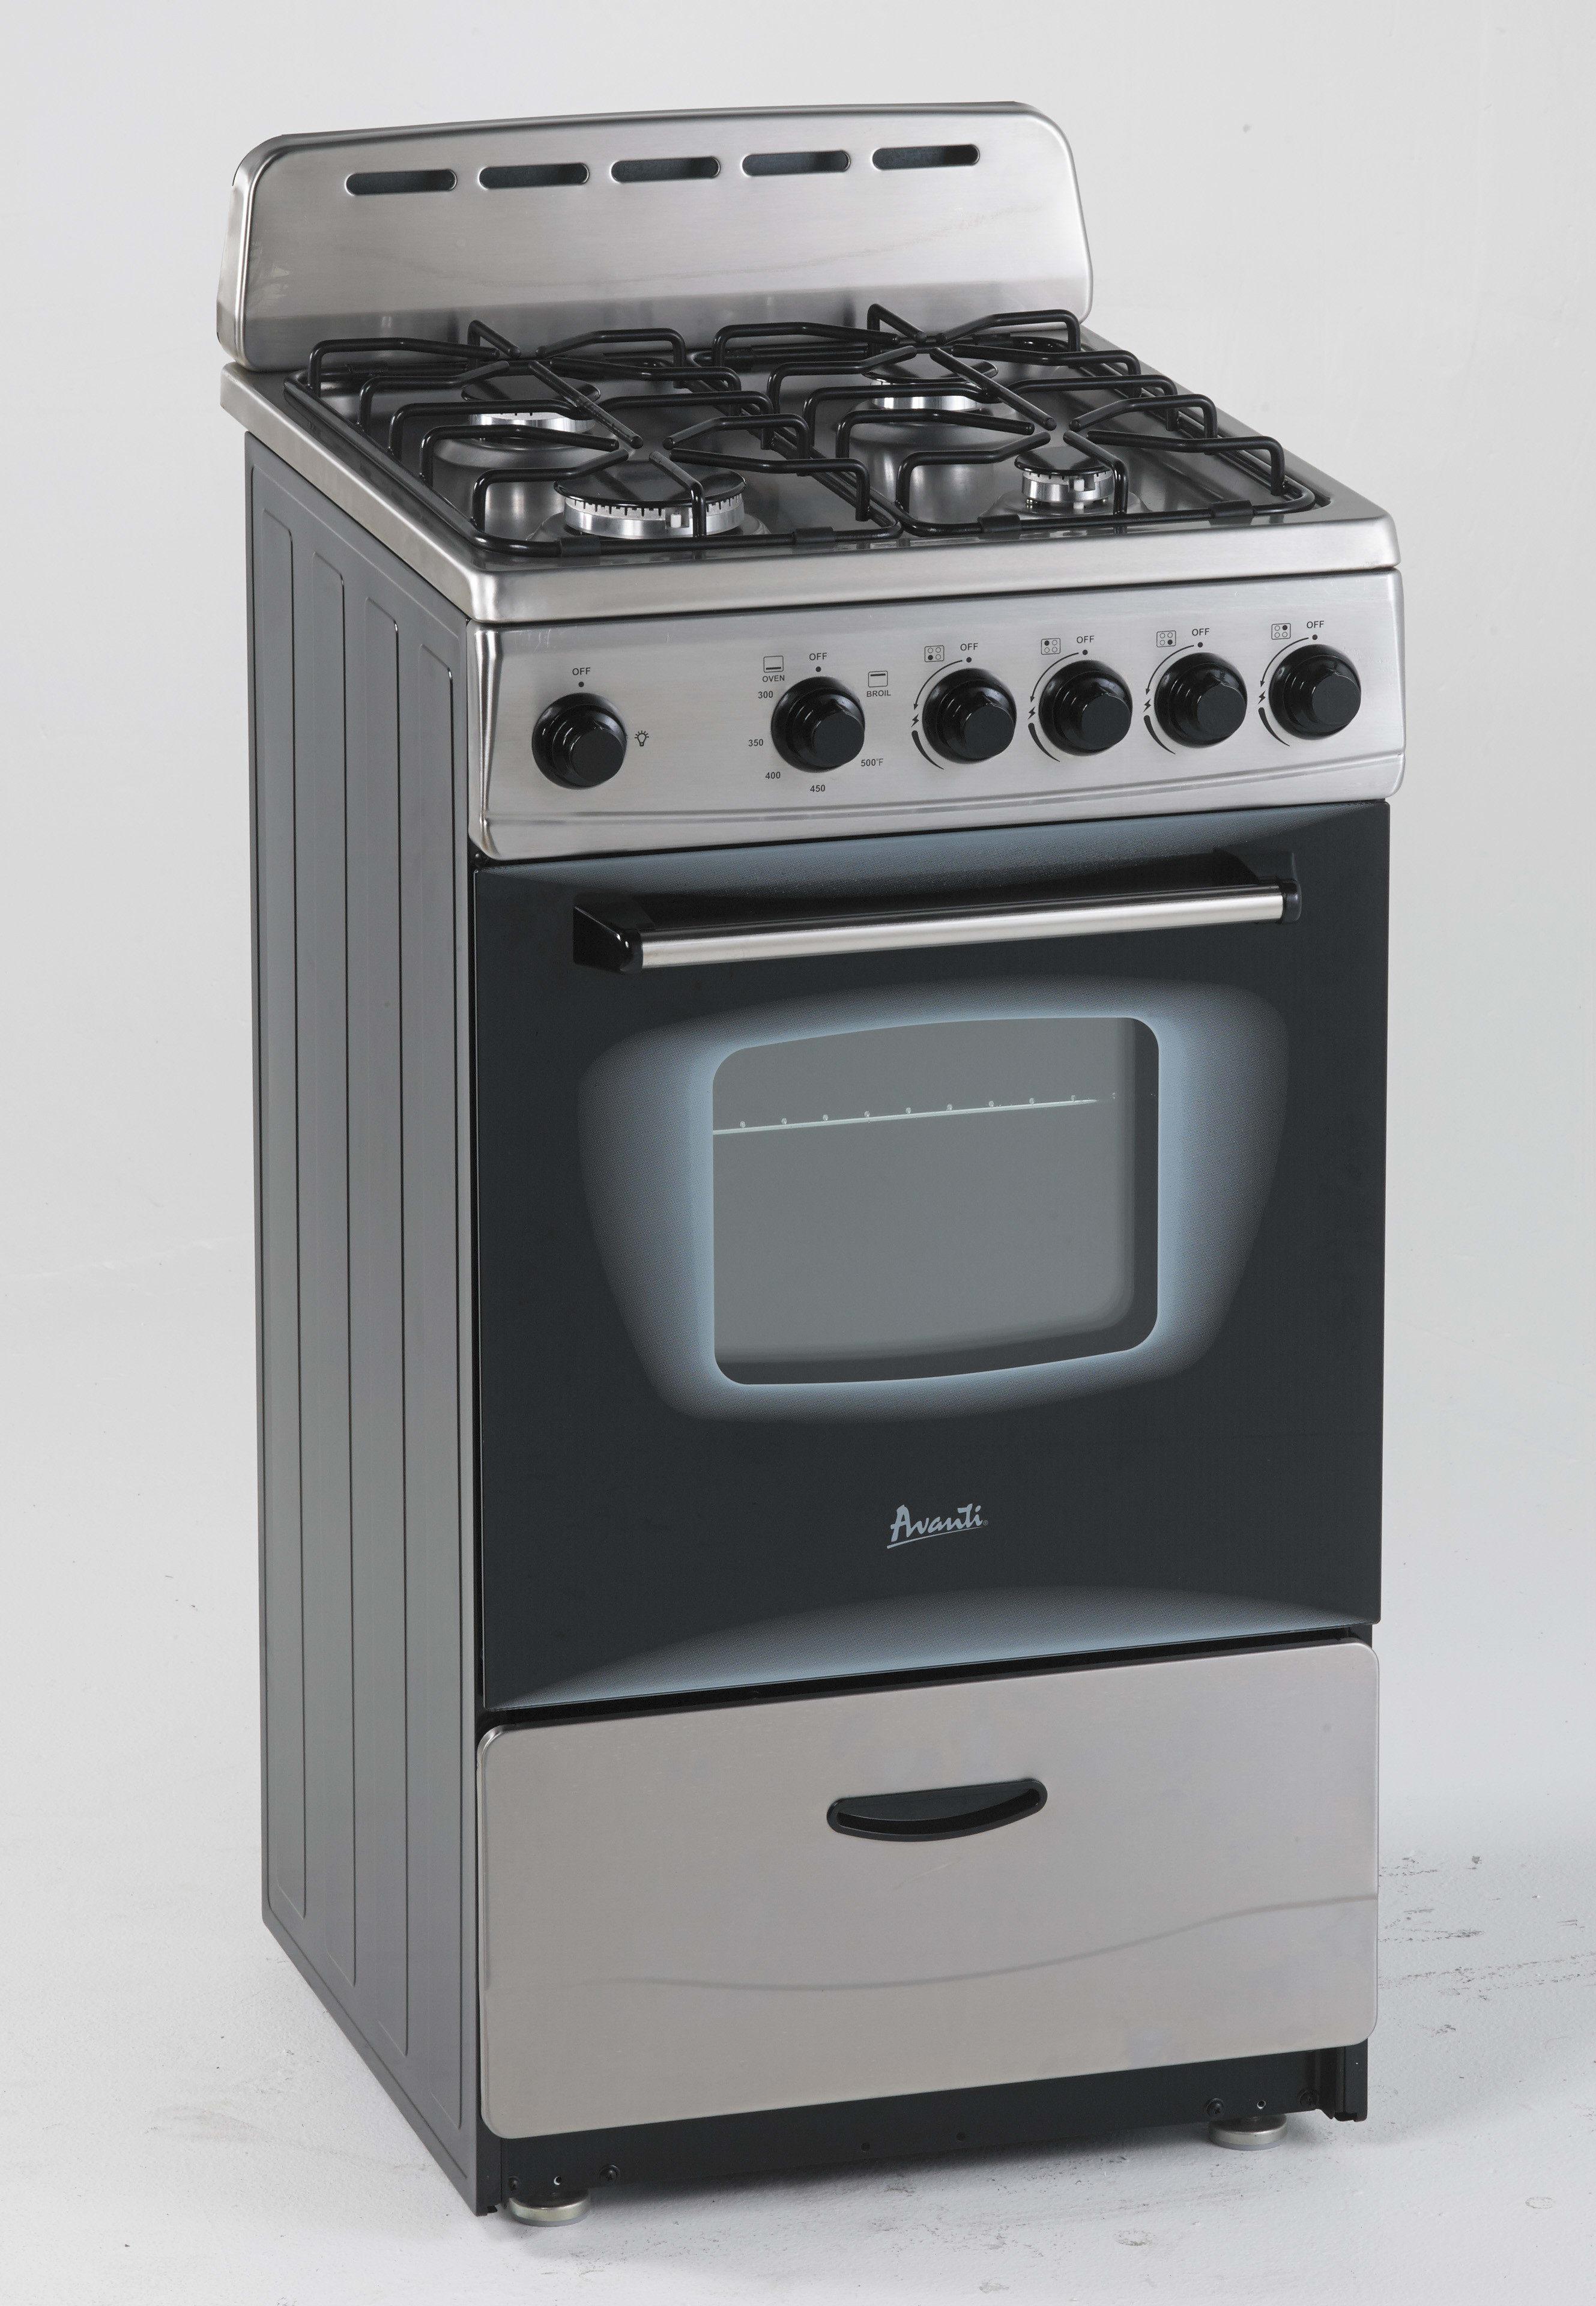 Avanti GR2013CSS 20 Inch Freestanding Gas Range With 2.1 Cu Ft. Capacity, 4  Sealed Burners, Waist High Broiler, Backsplash, LP Conversion Kit, ...